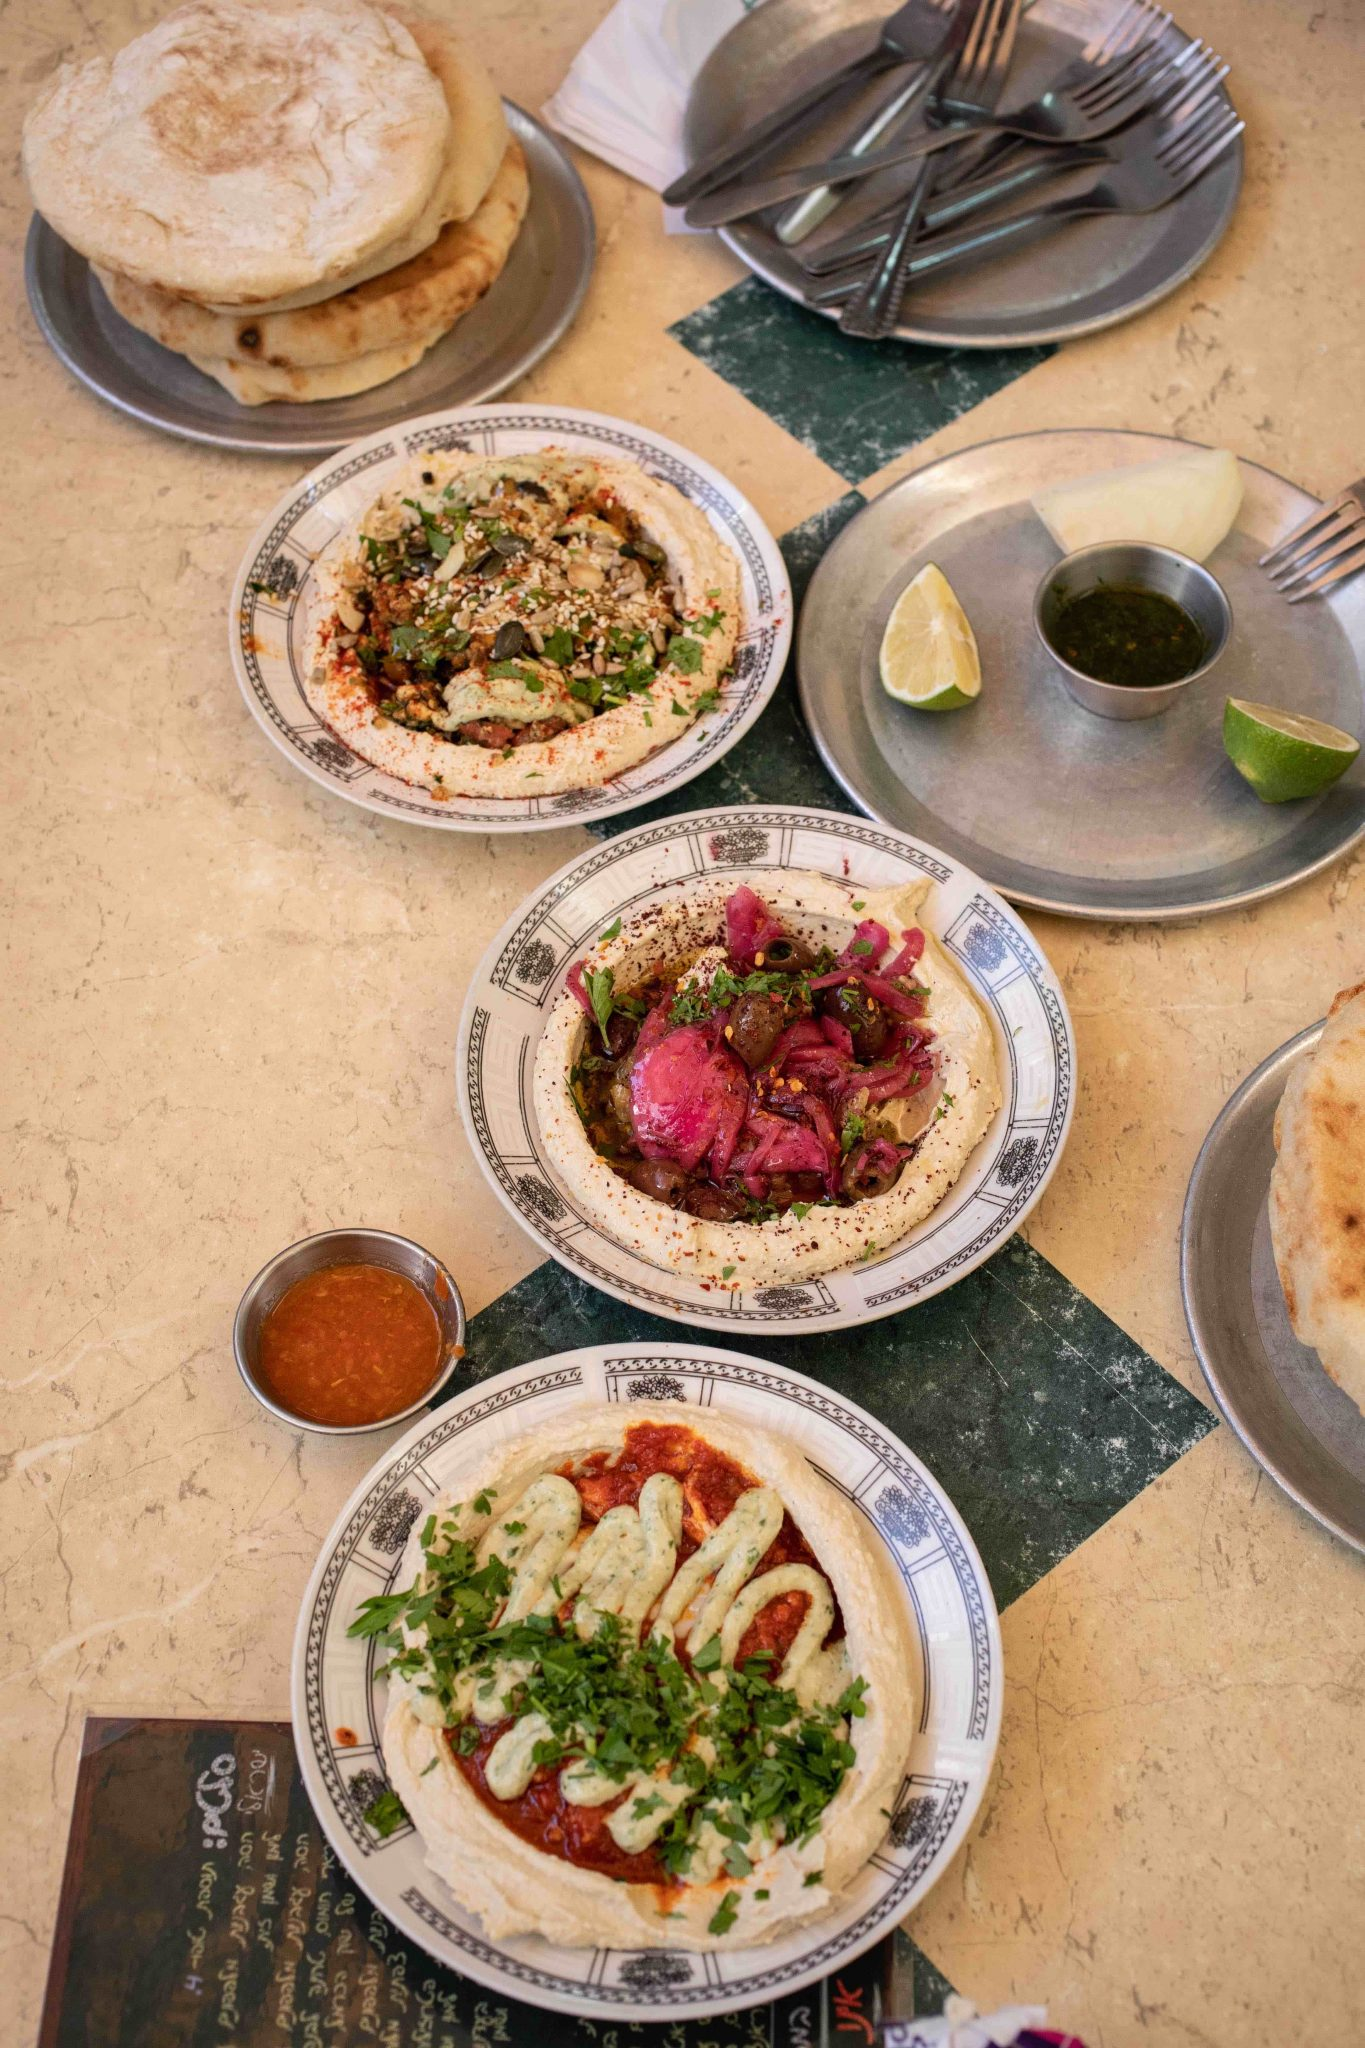 Food - Hummus and Pita